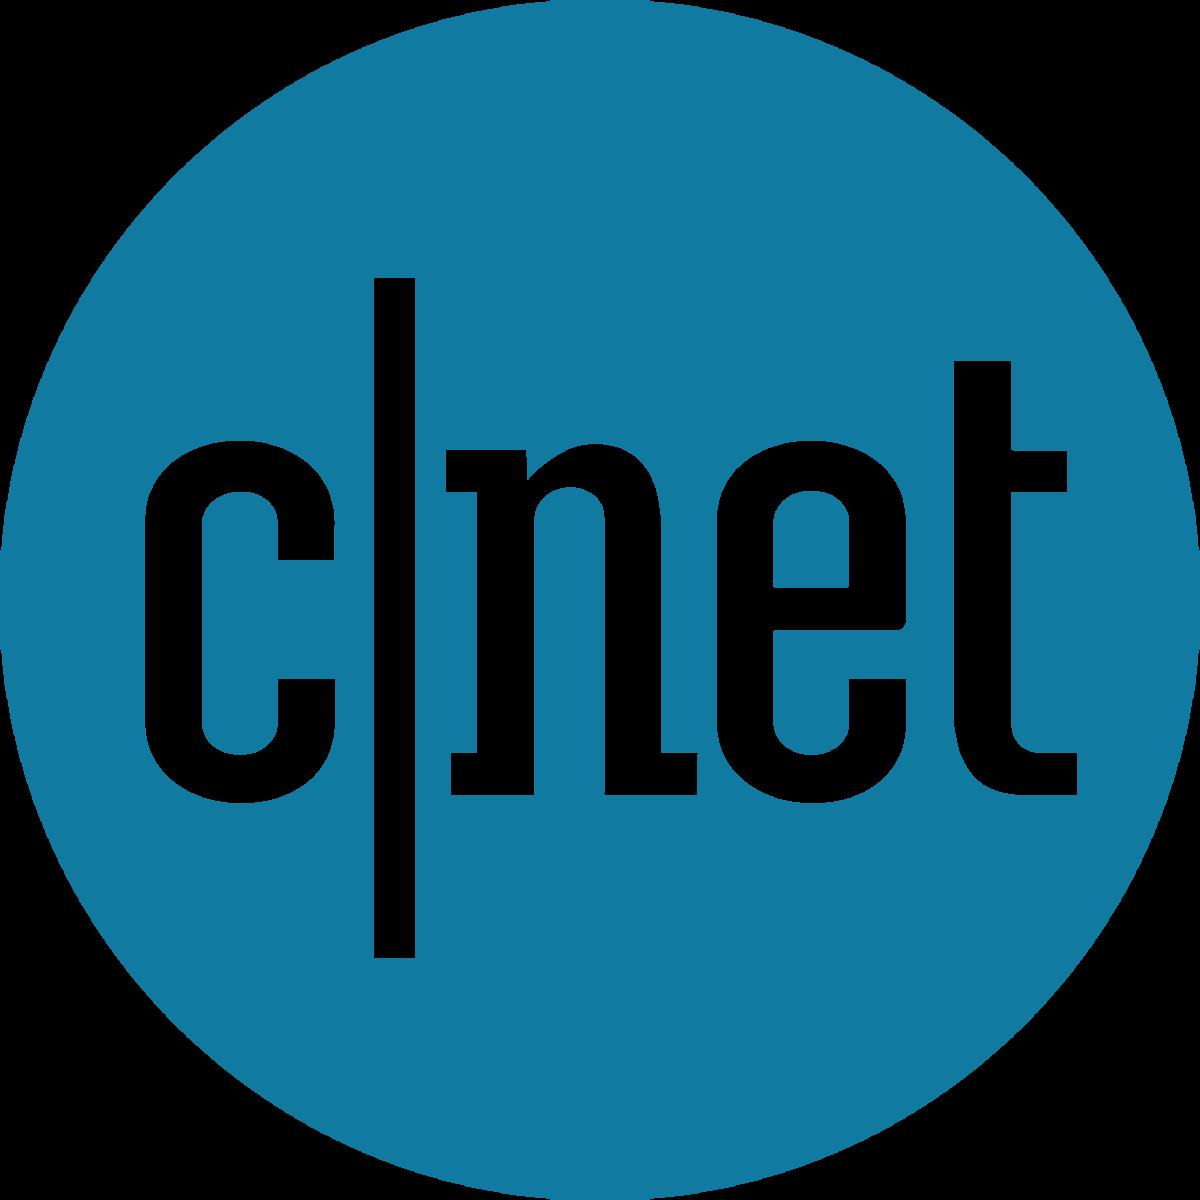 cnet-blue